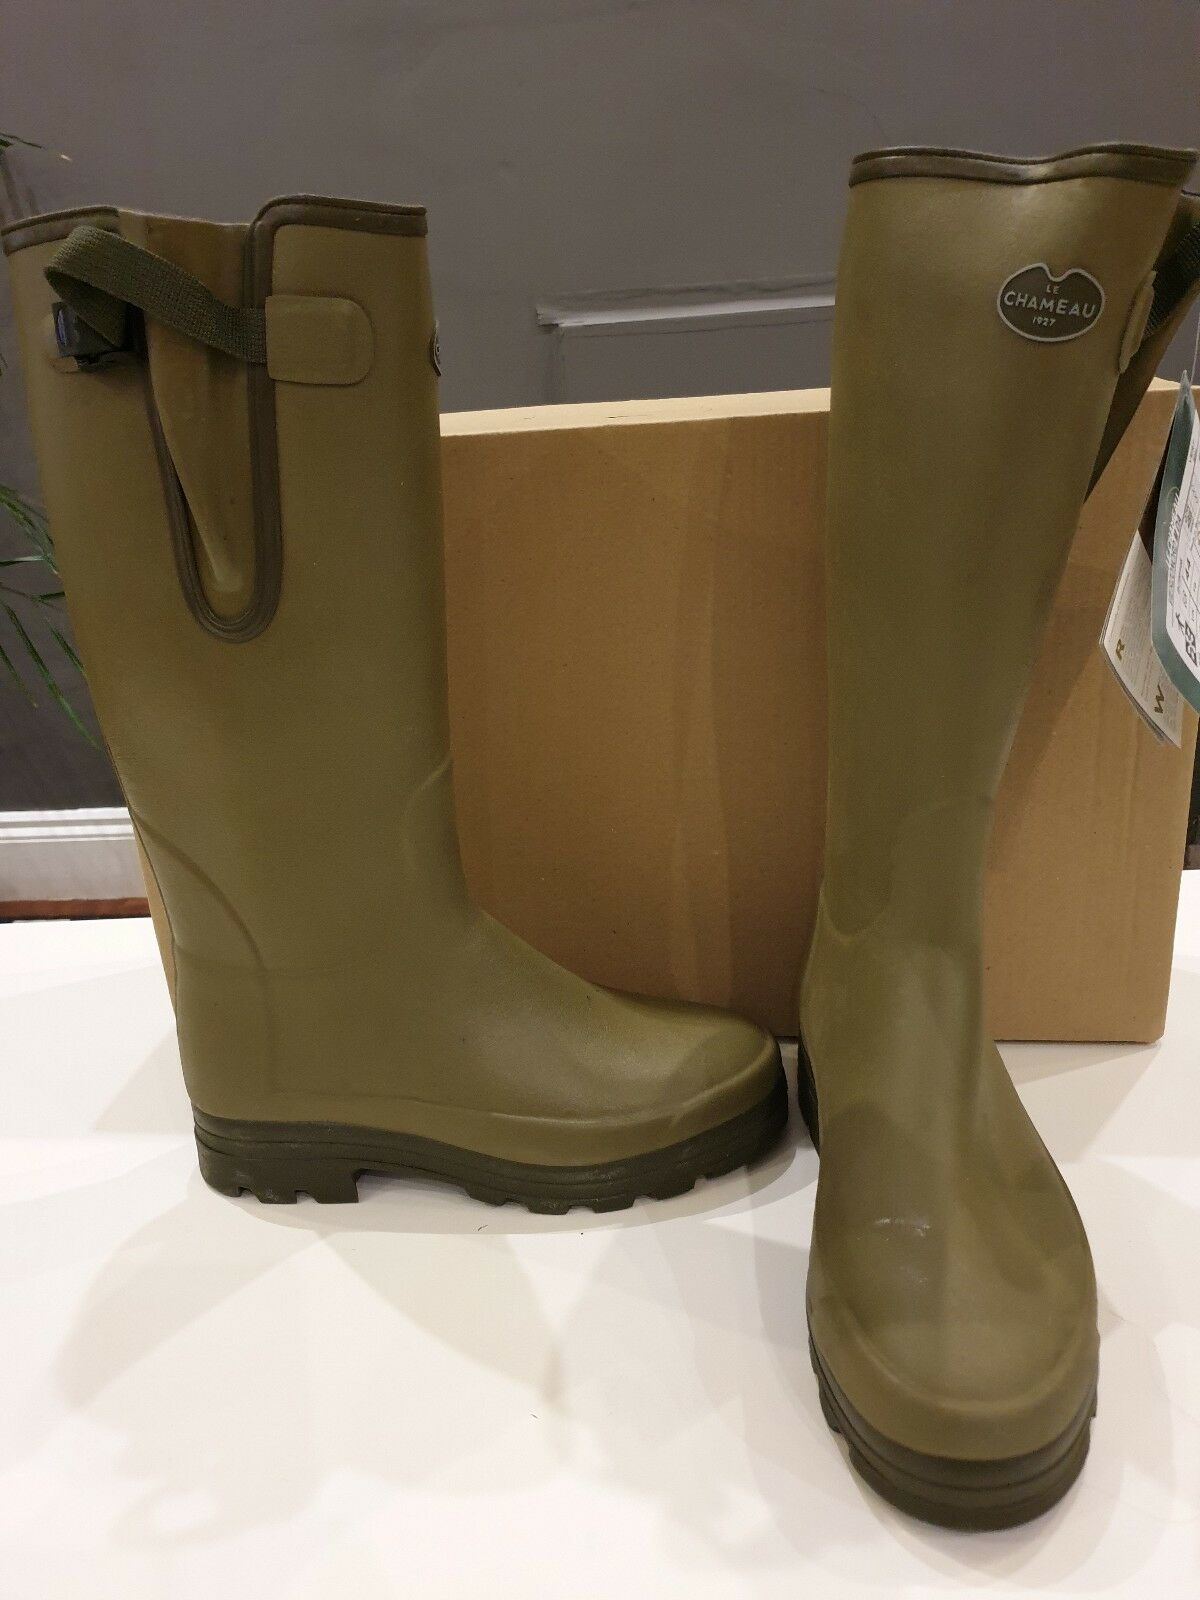 Le Chameau Vierzonord Hombre Neopreno Forrado botas Reino Unido 12 verde Venta